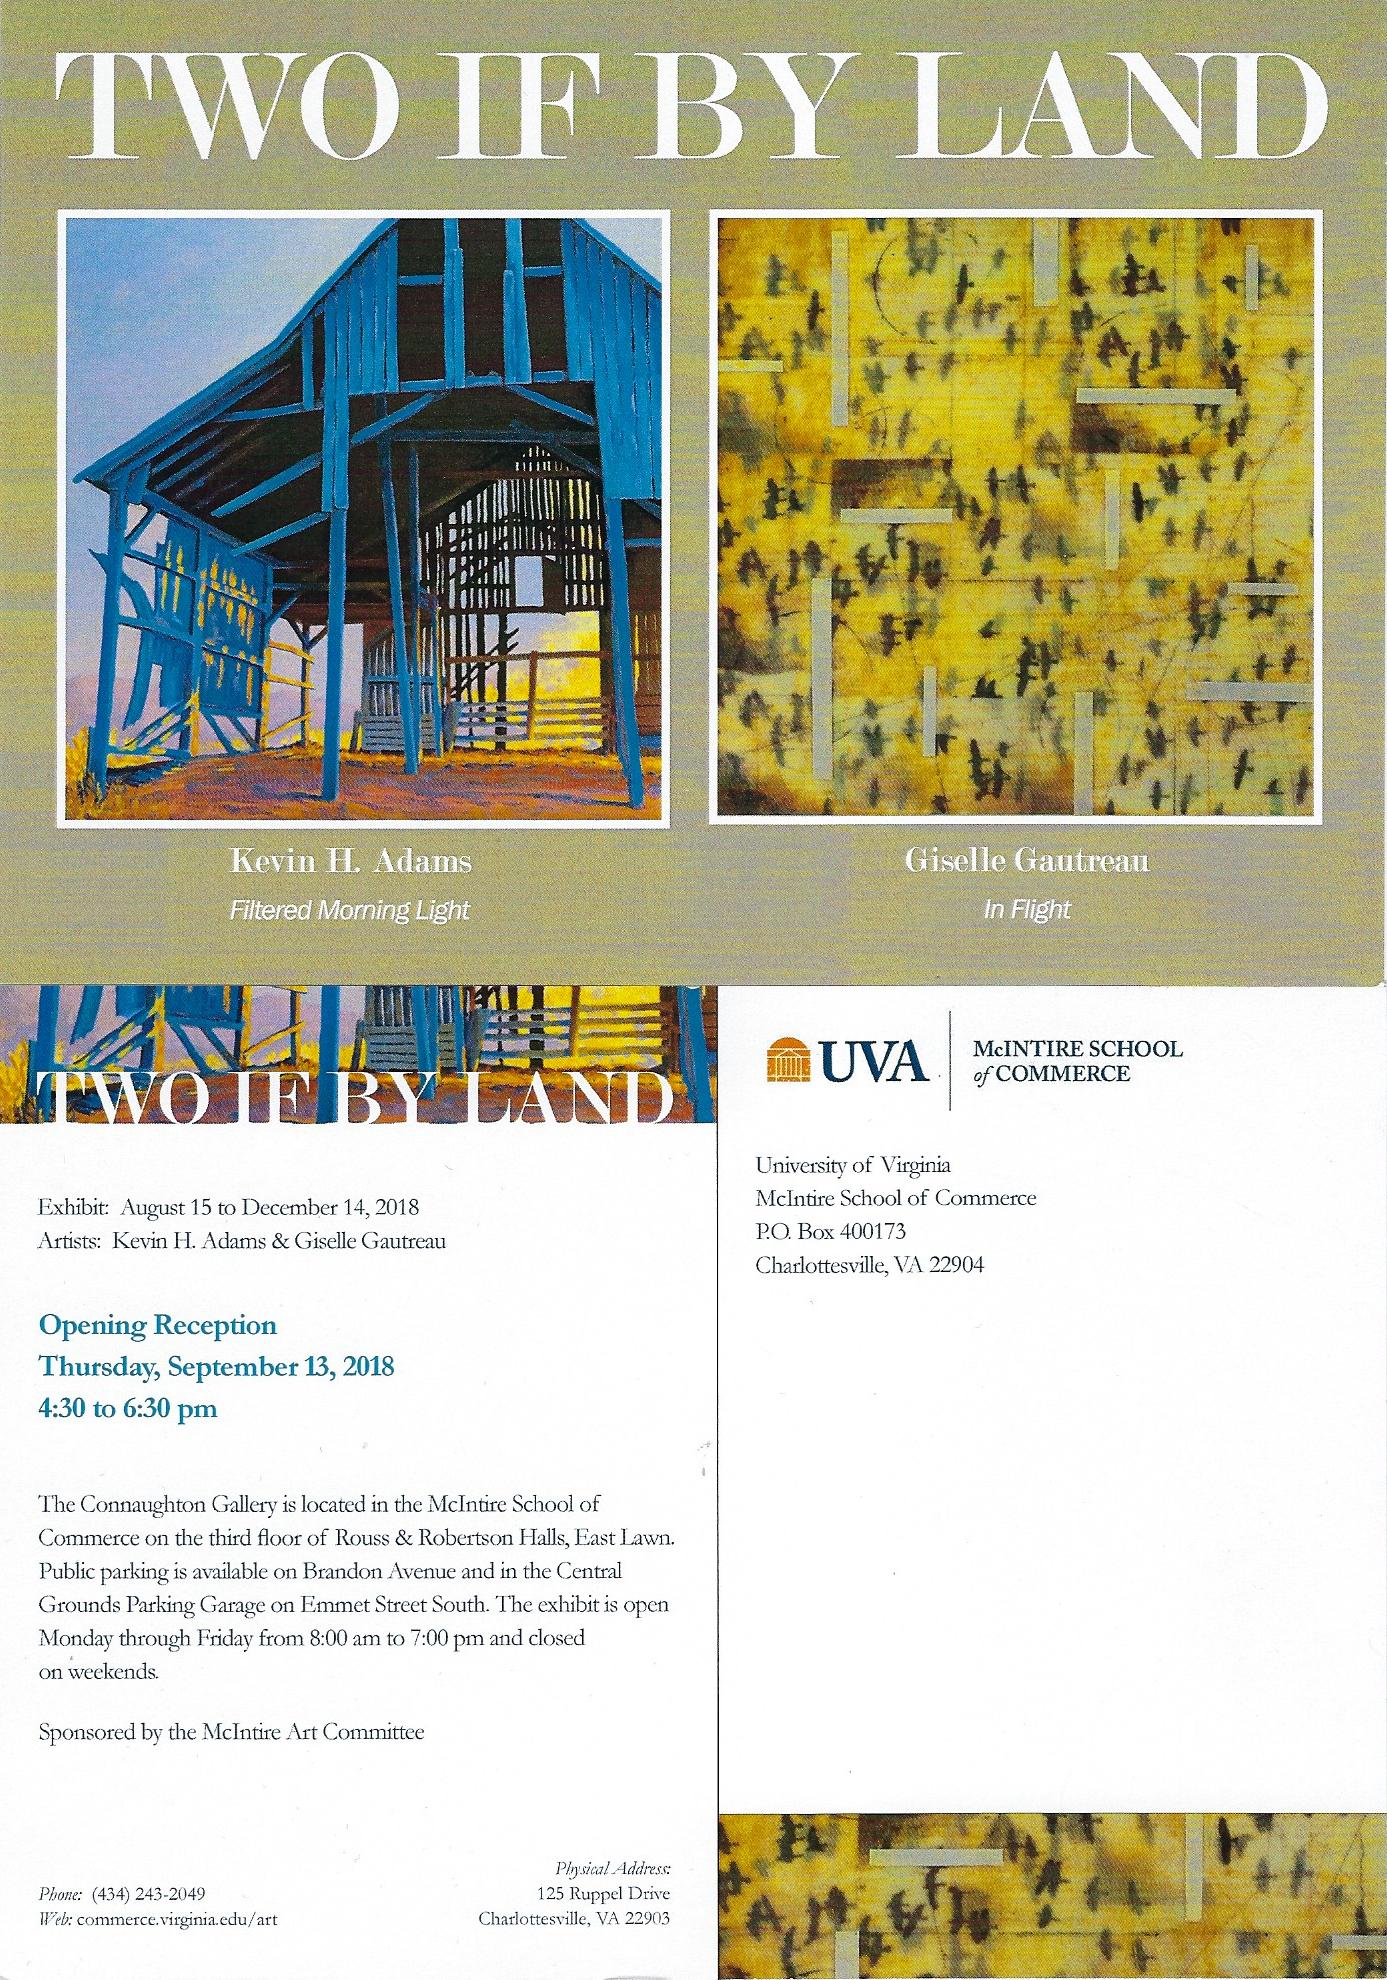 UVA SHOW INVITE.jpg